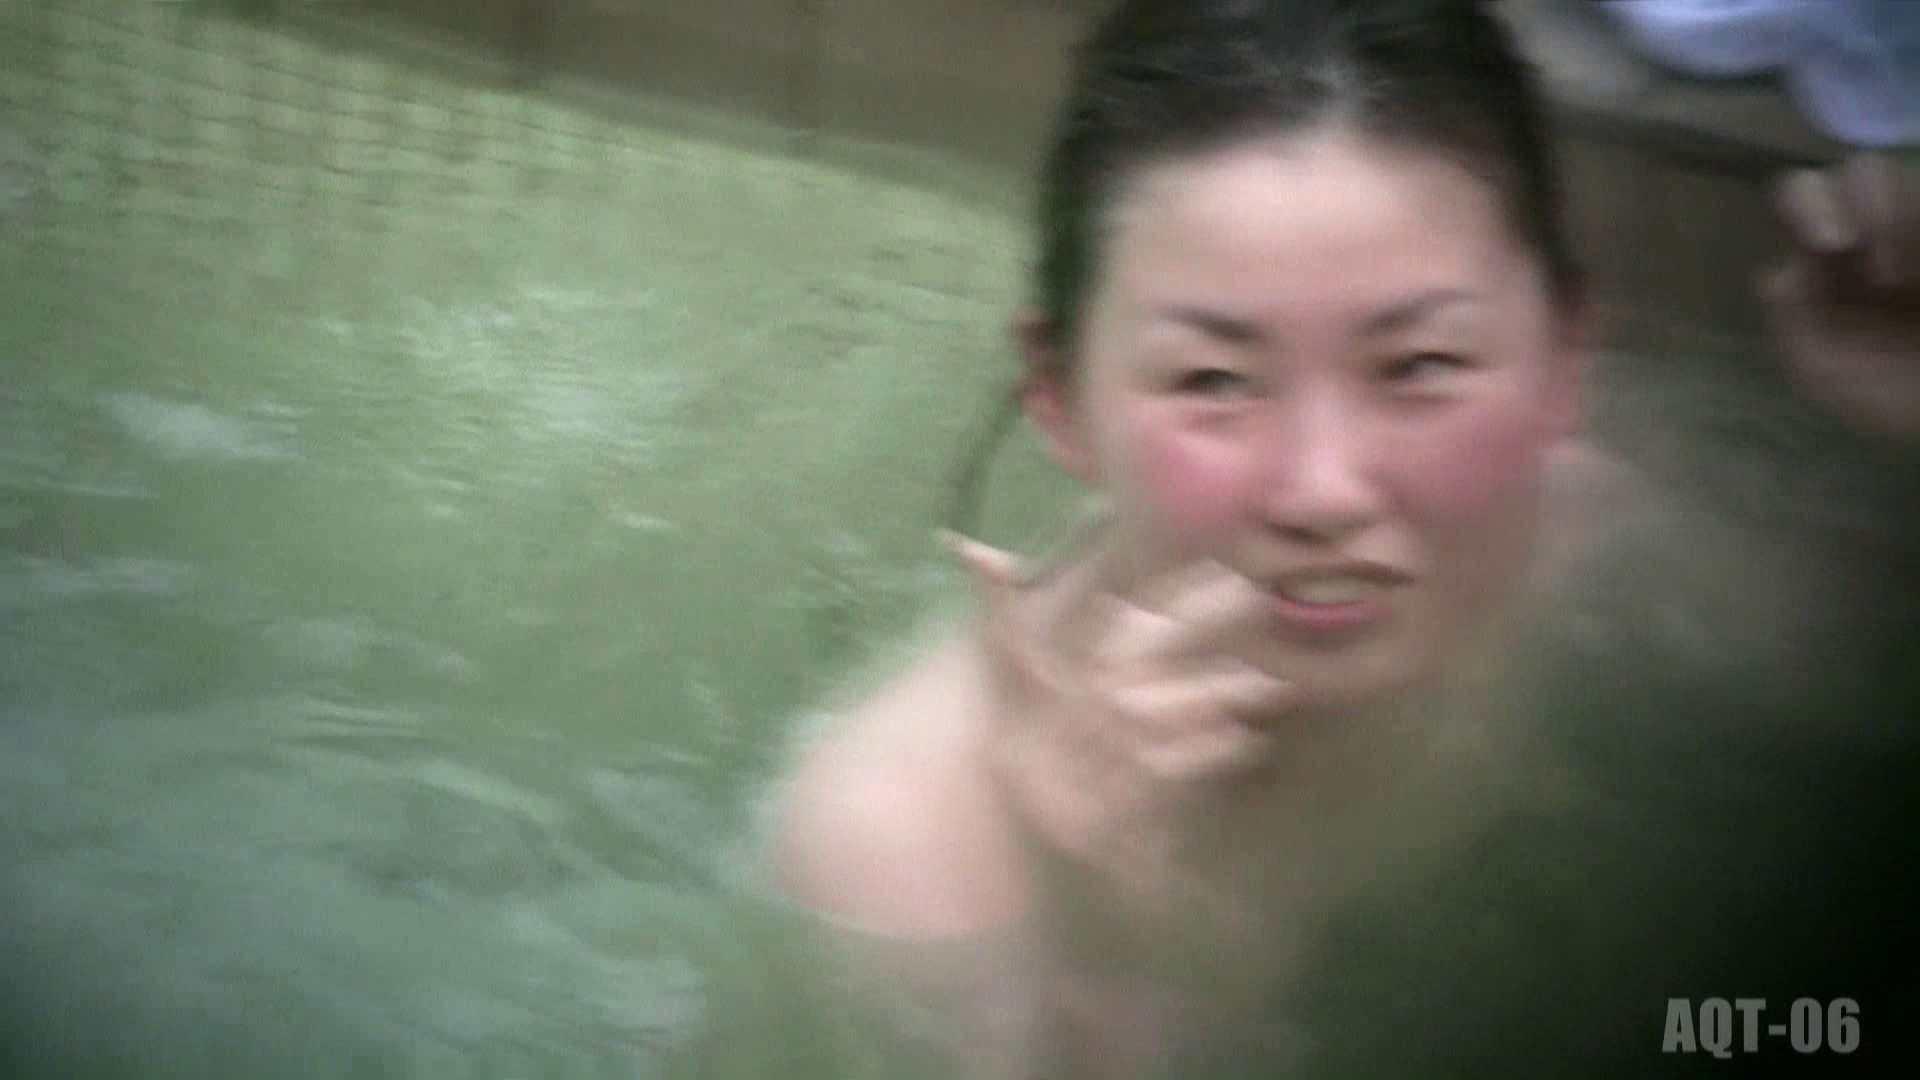 Aquaな露天風呂Vol.758 OL女体 すけべAV動画紹介 90連発 32